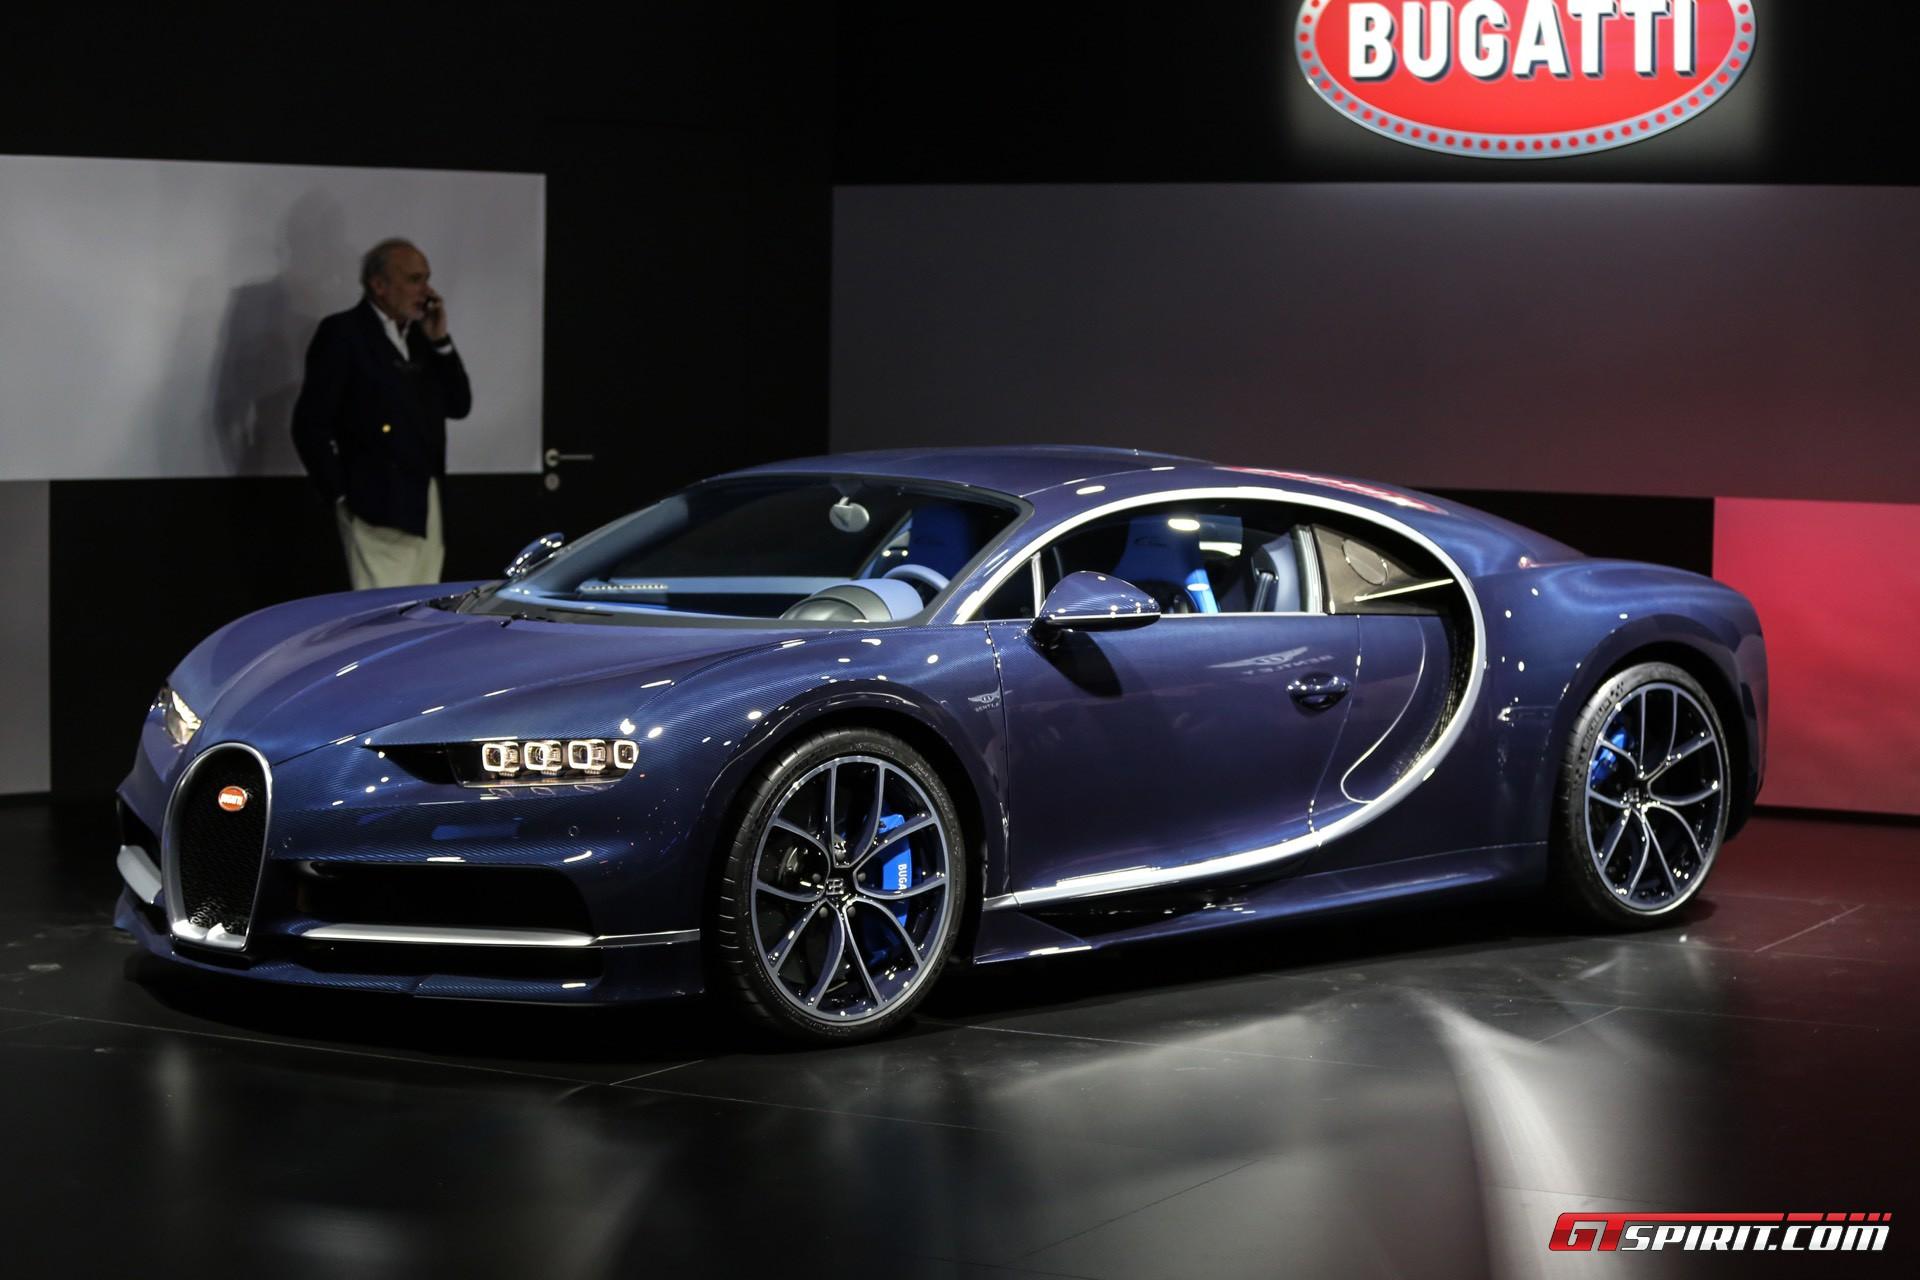 bugatti chiron review bugatti s new 261mph hypercar tested autocar we are 10 000. Black Bedroom Furniture Sets. Home Design Ideas